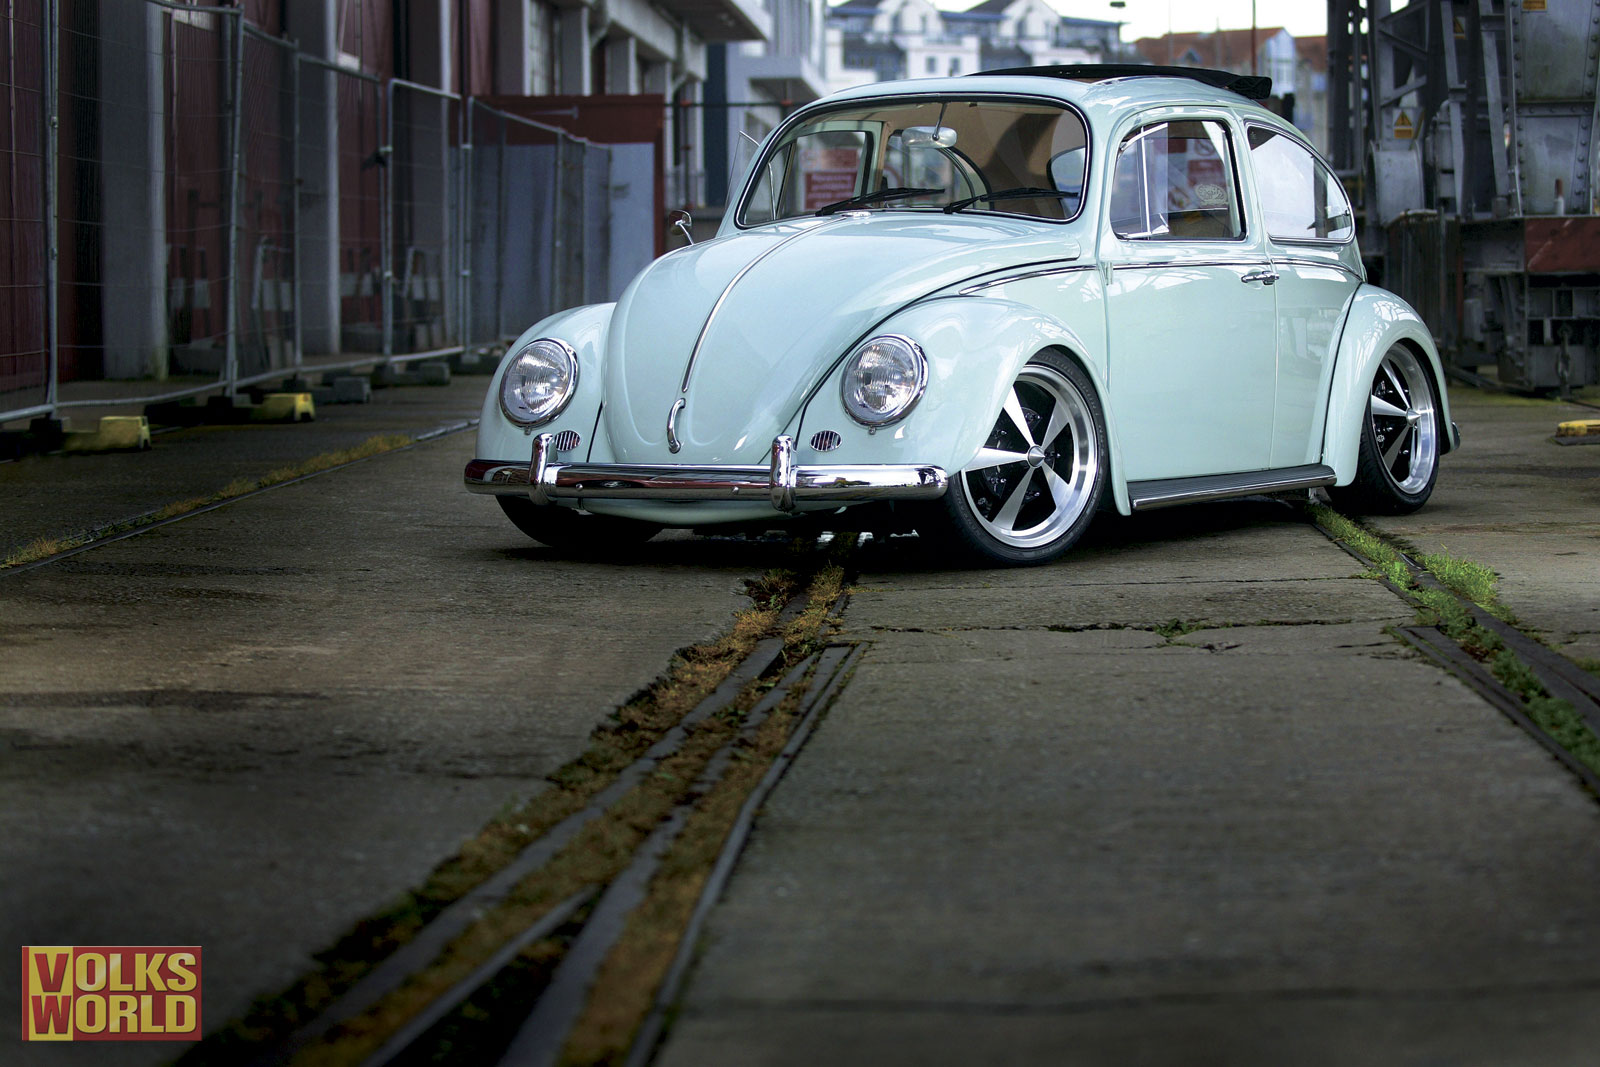 vw beetle volkswagen beetle 23460464 1600 1067jpg 1600x1067